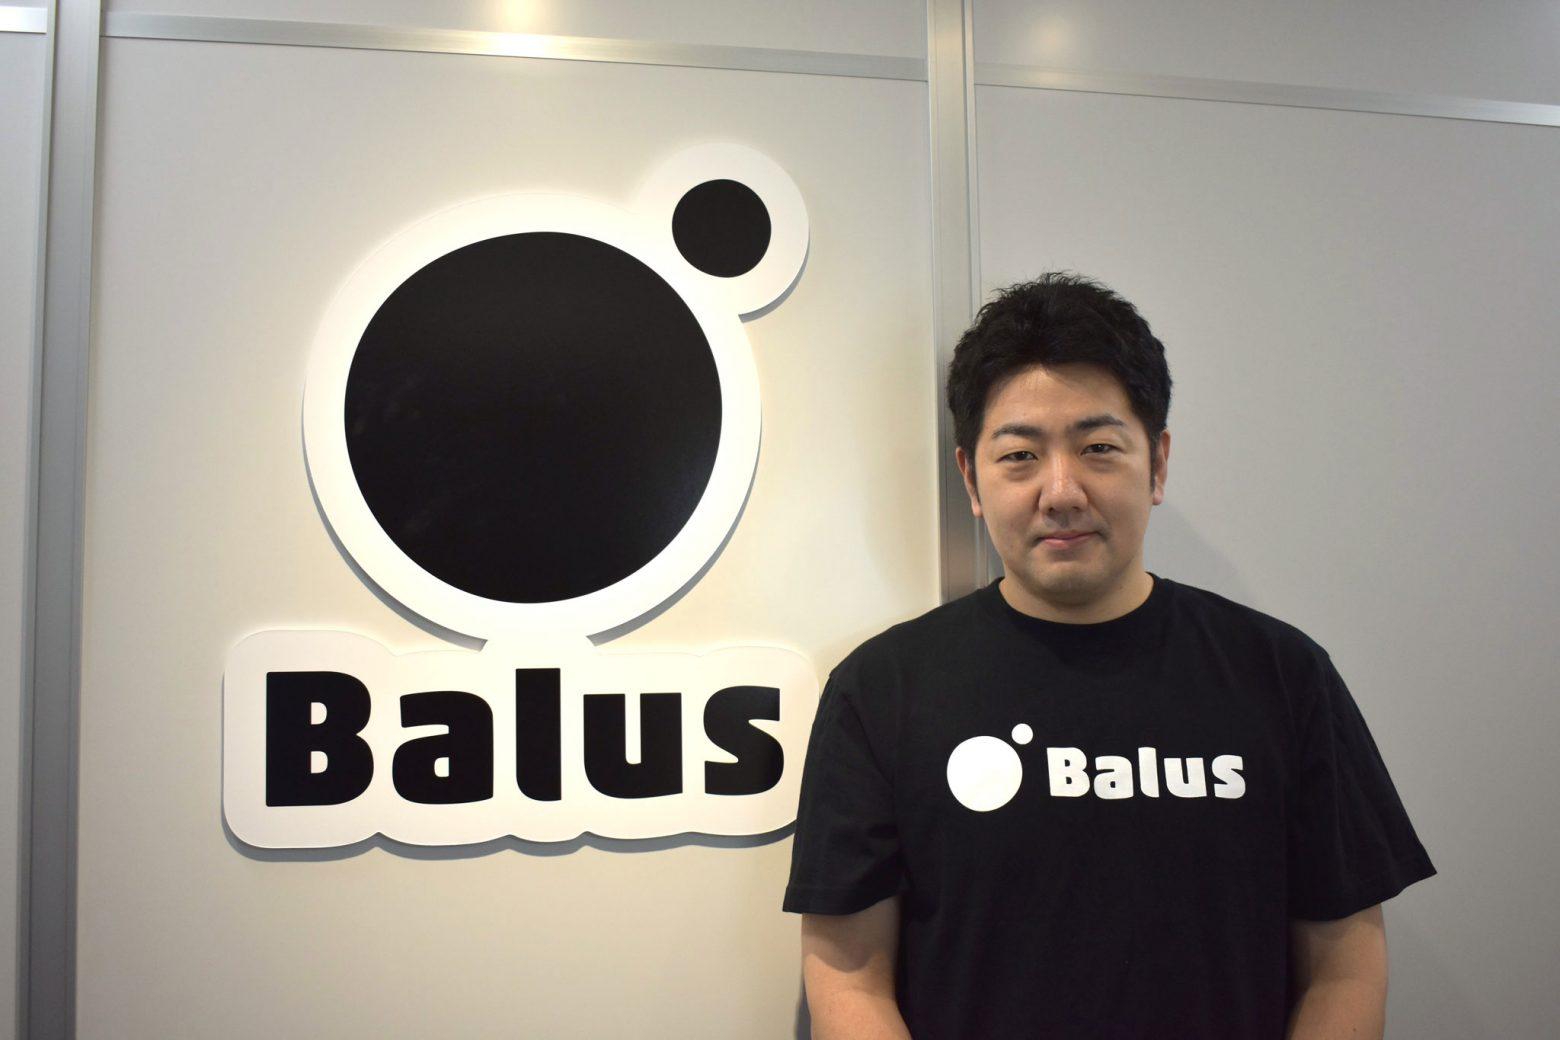 Balus CEO 林範和氏